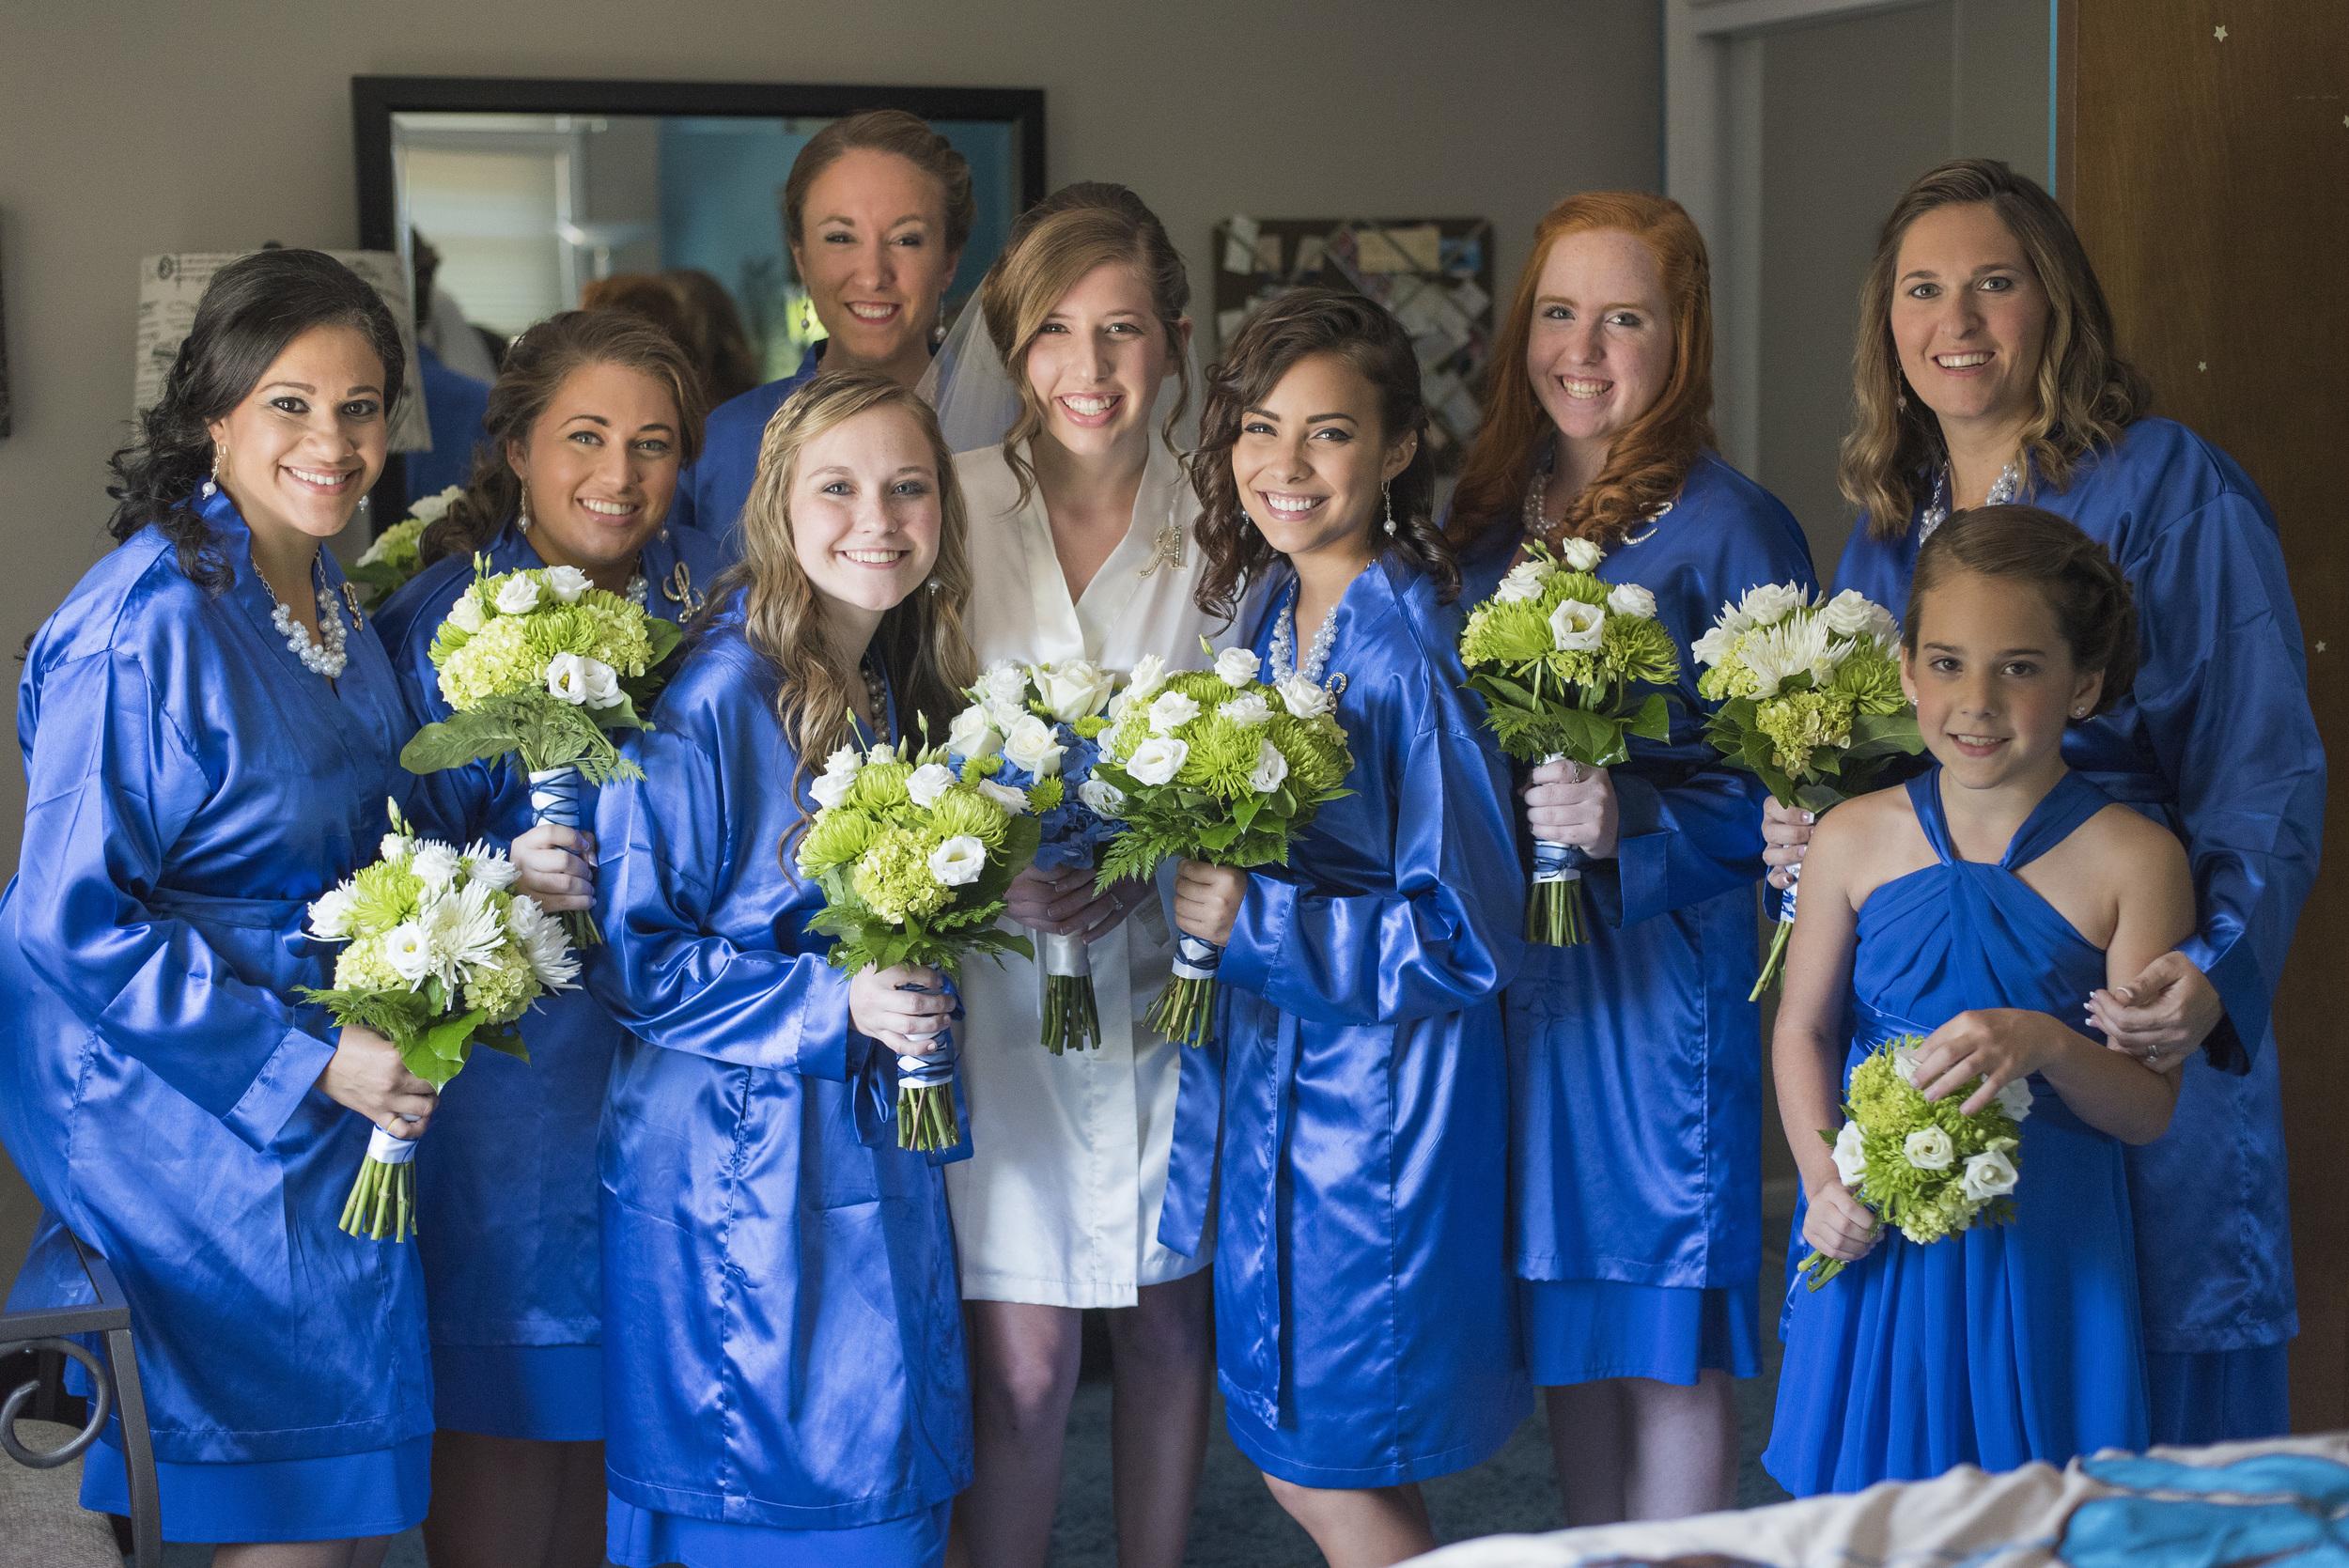 New_jersey_blue_heron_pines_wedding20150529_0515.jpg